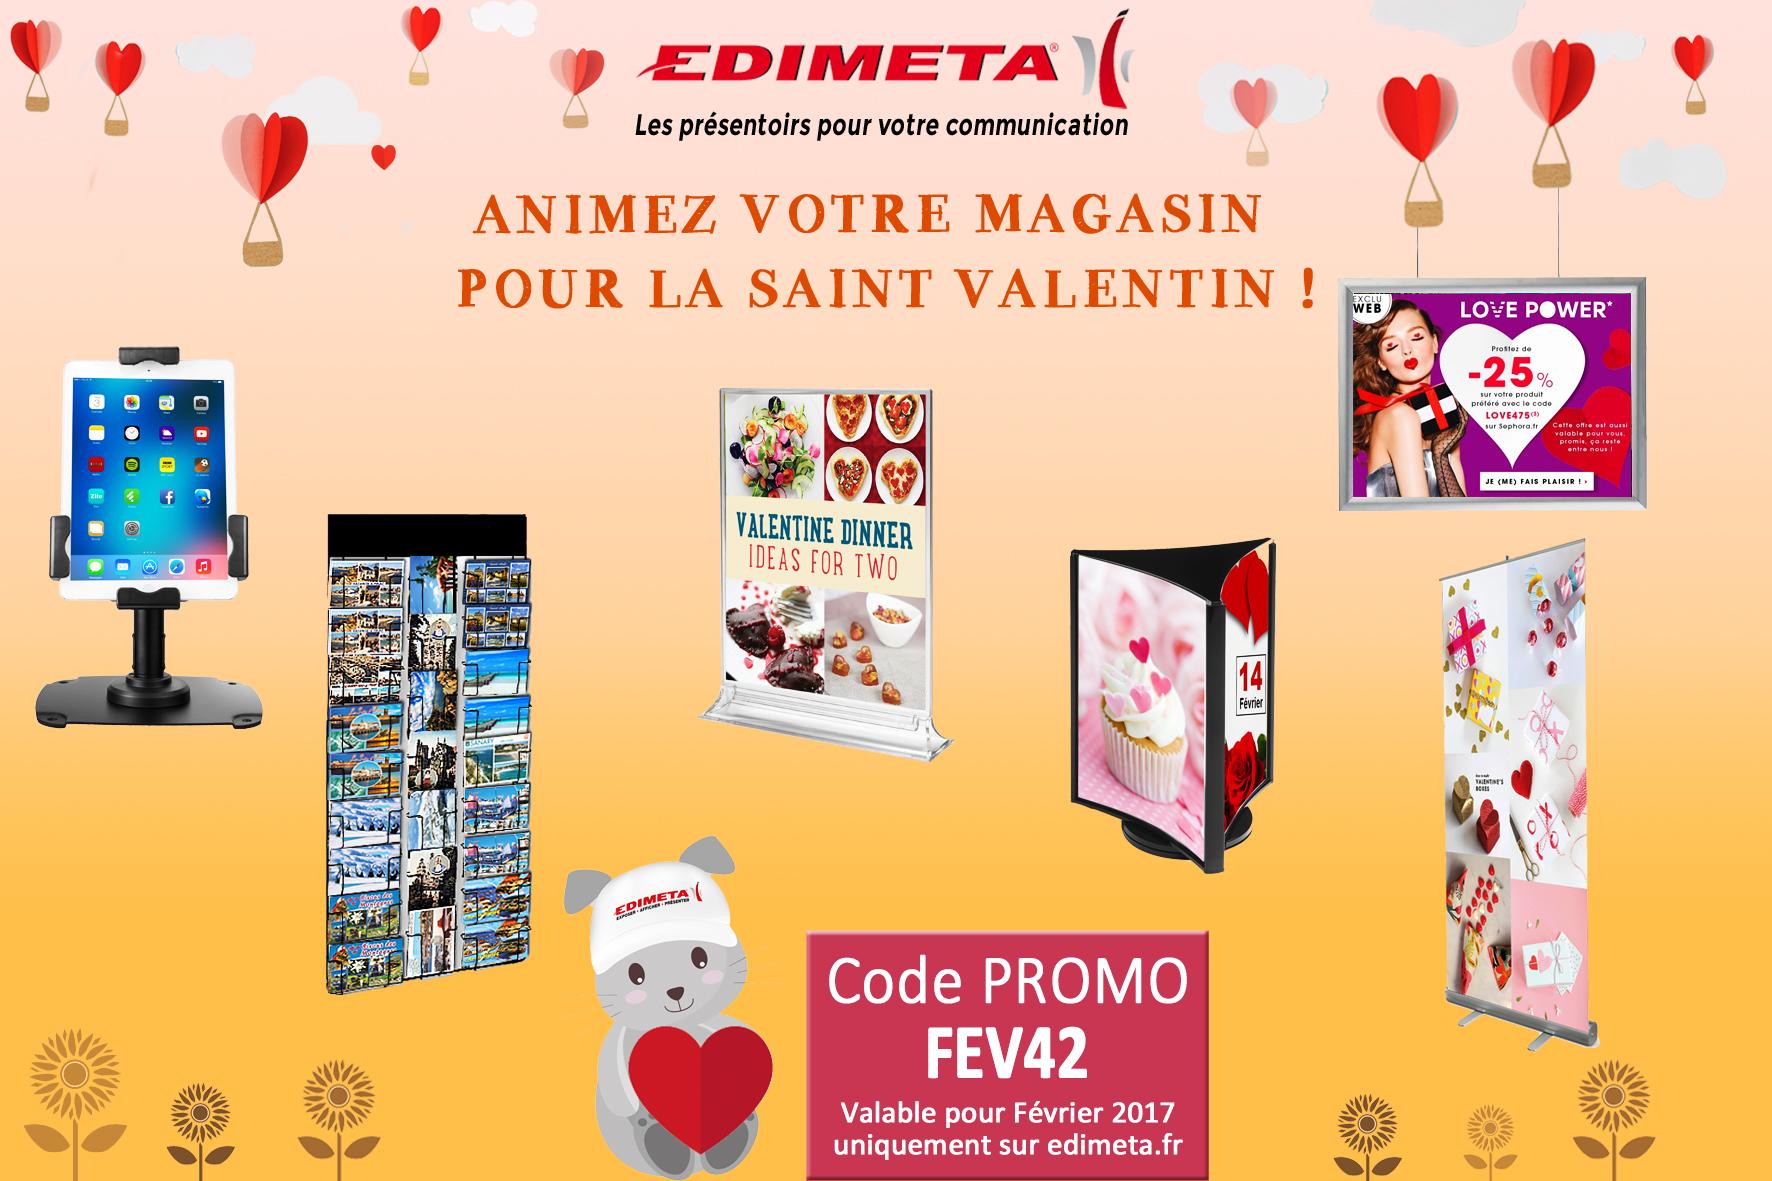 EDIMETA - Code promo pour Février 2017